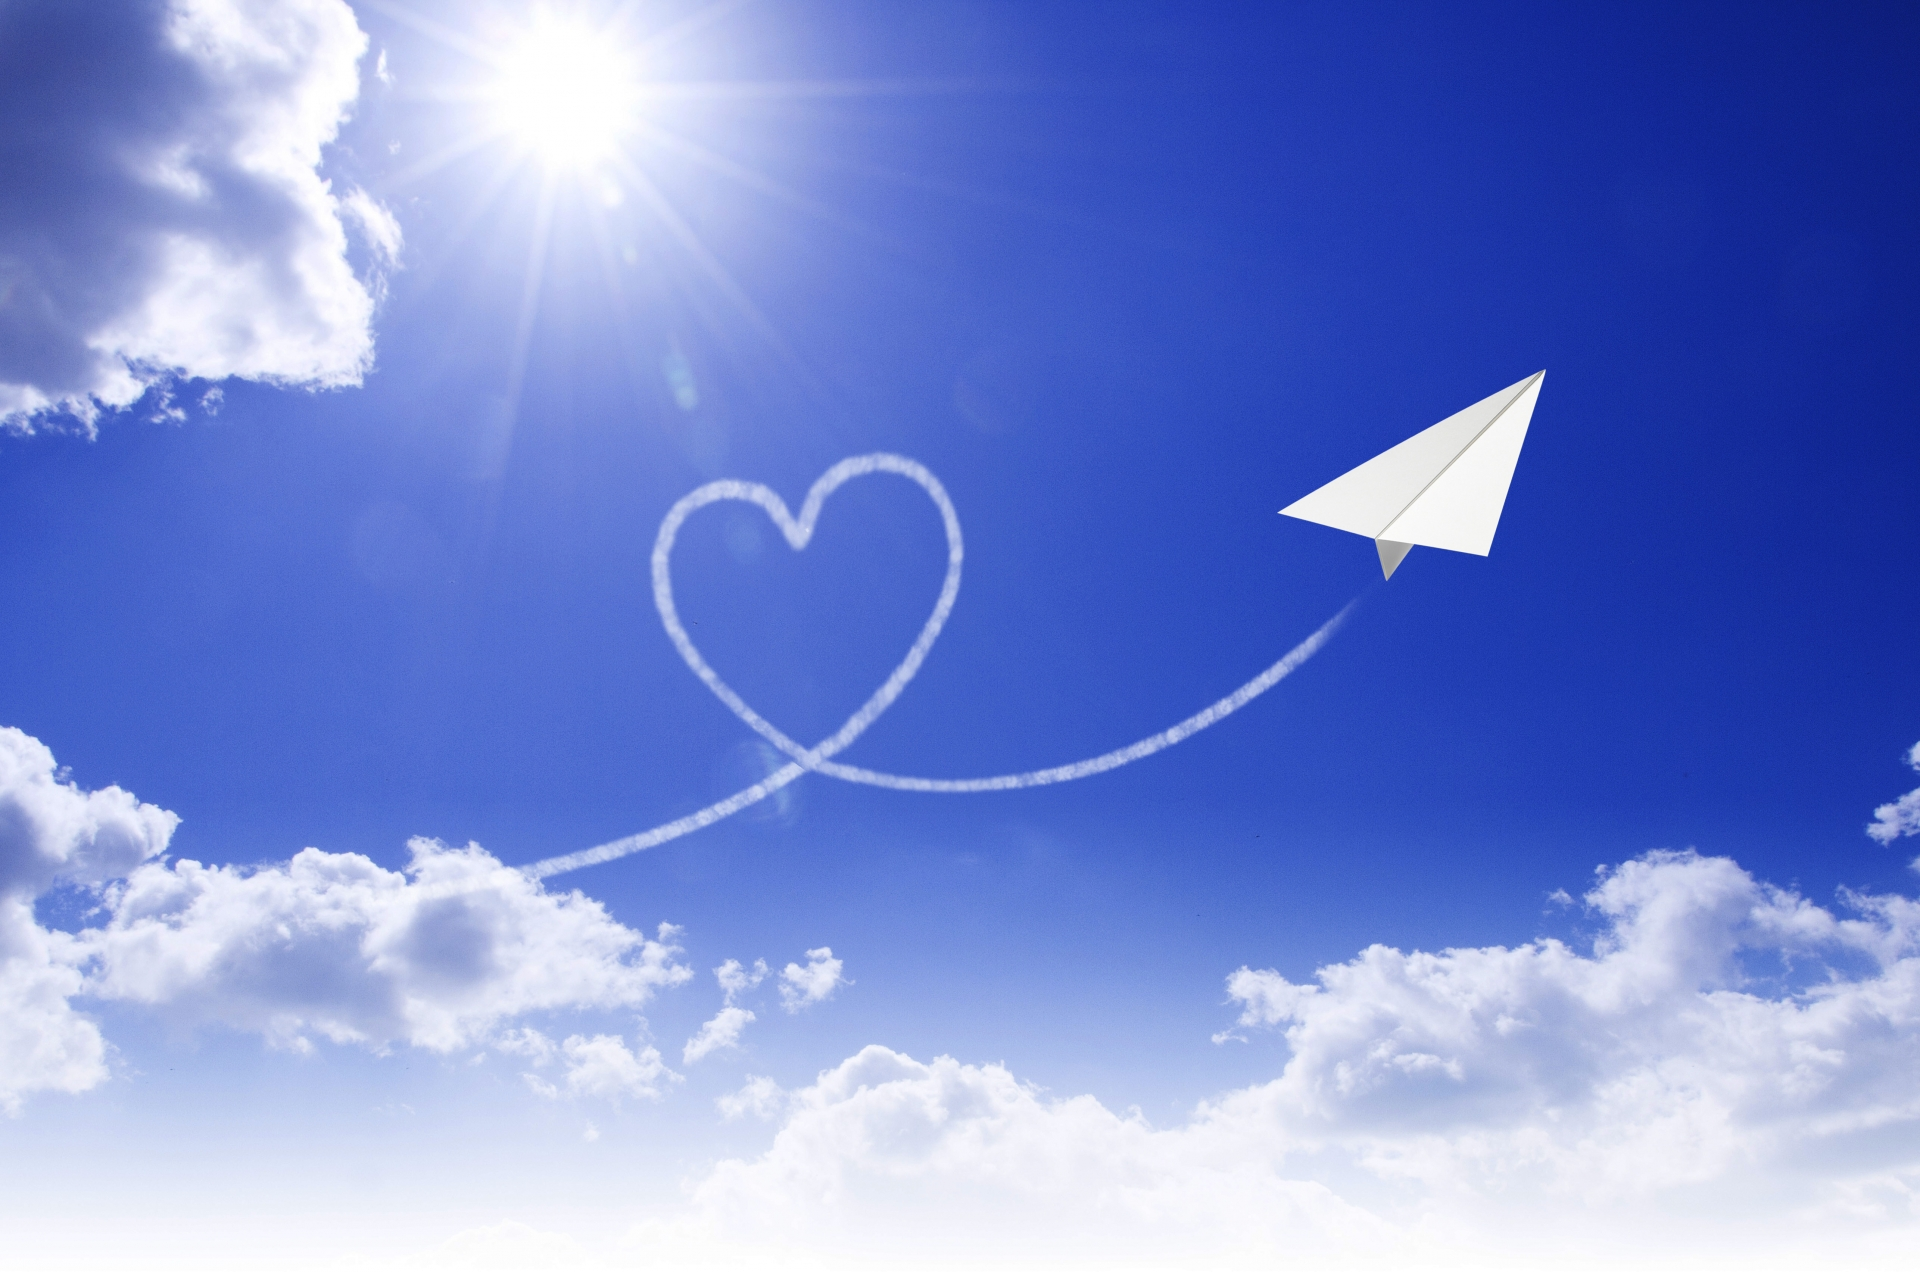 幸せ,恋愛成就,思考